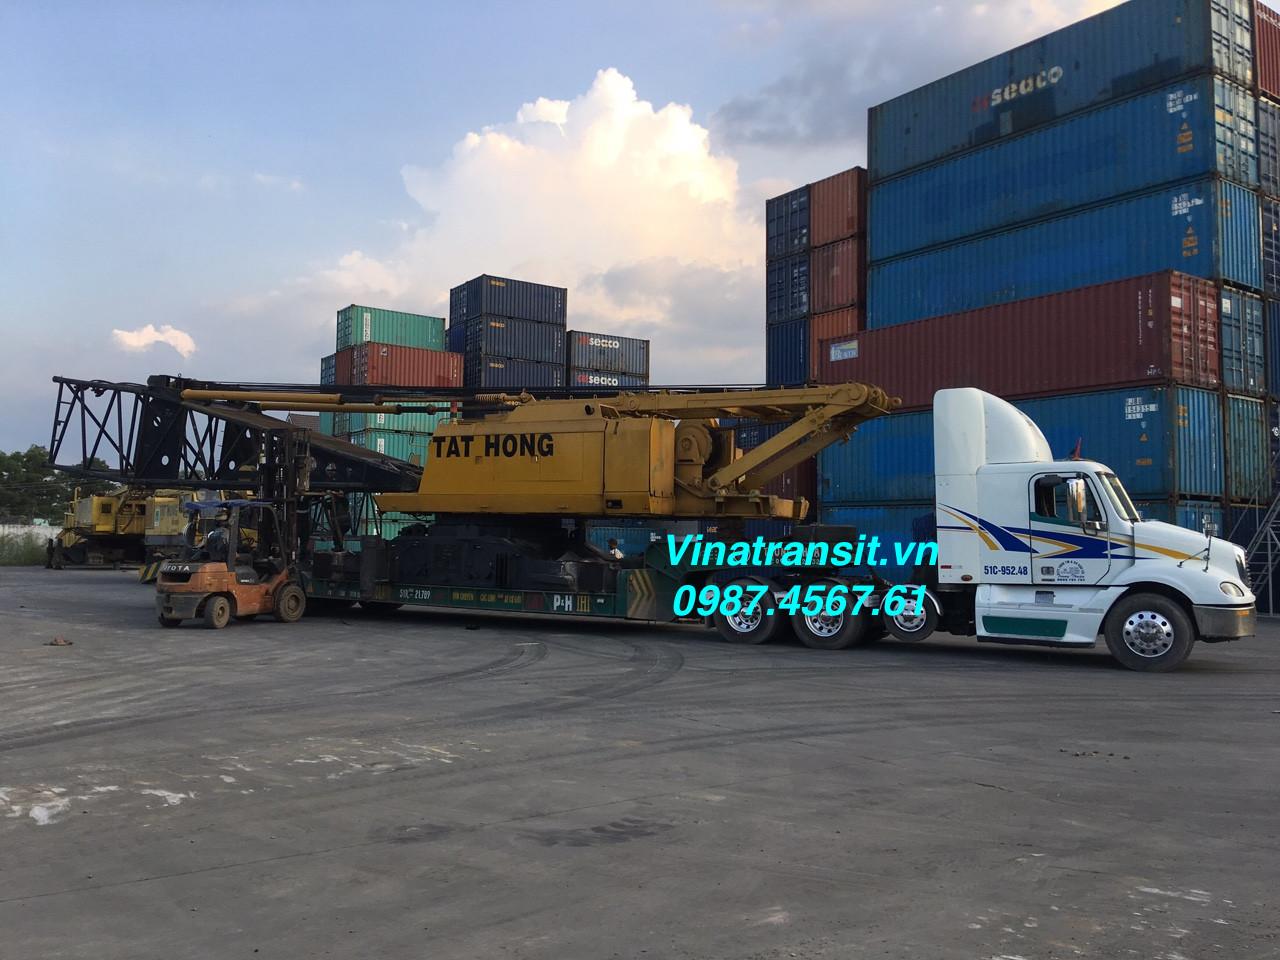 Vận chuyển hàng container đi kratie campuchia